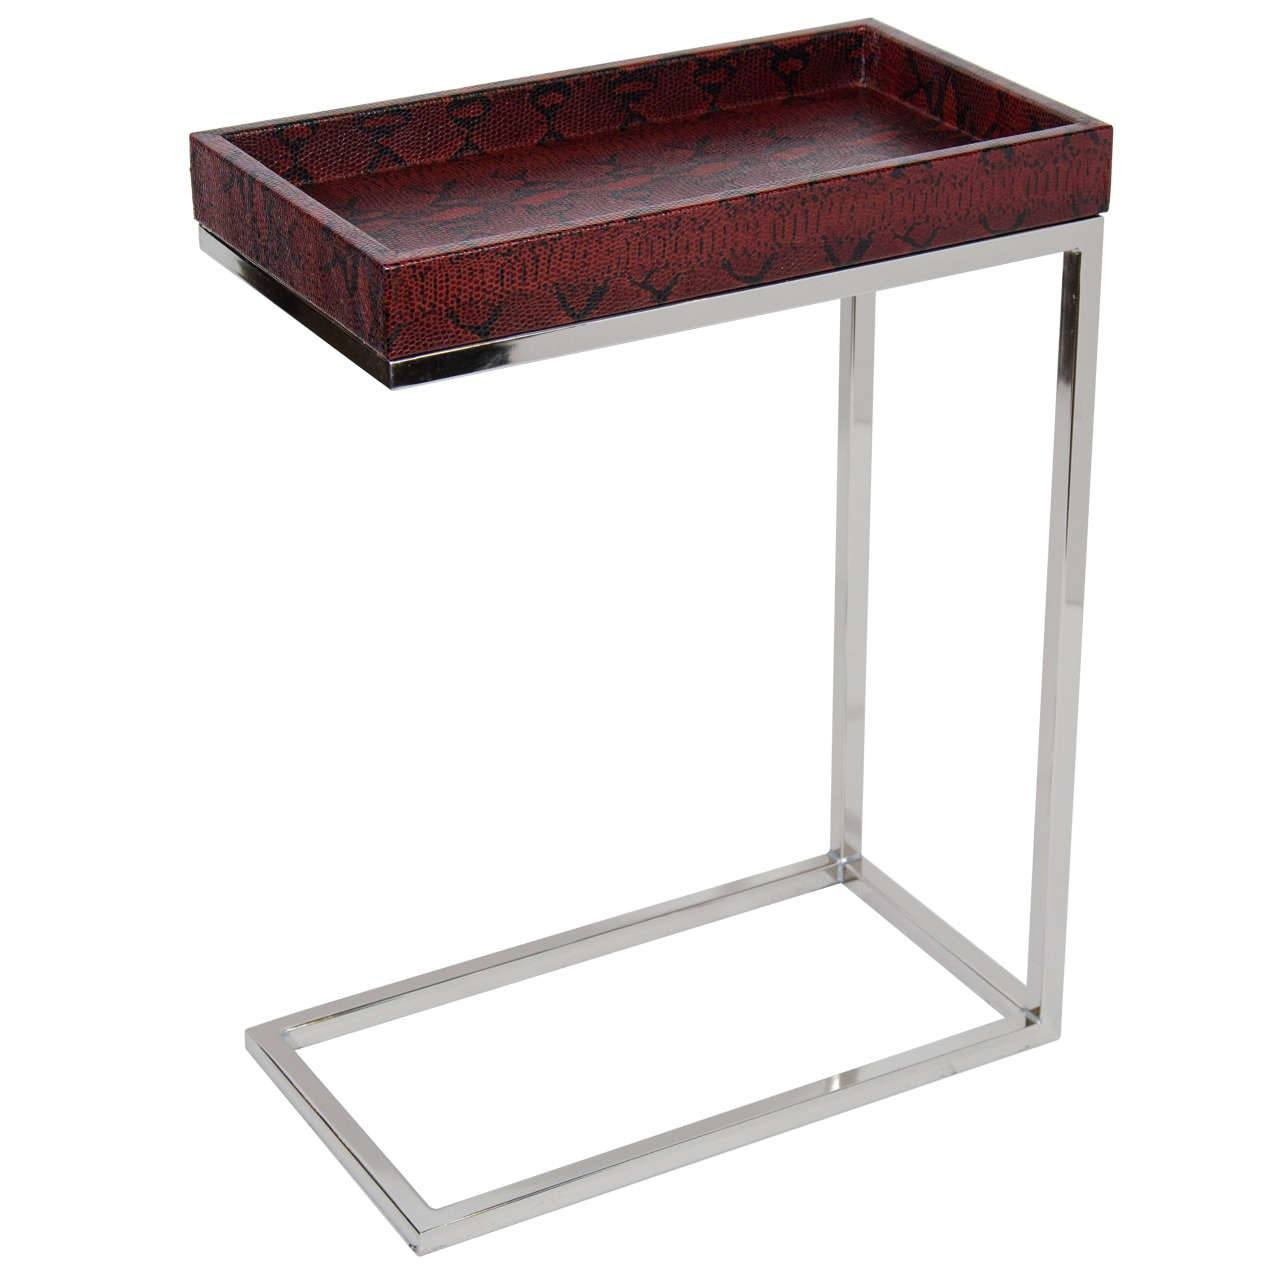 Skinny Coffee Table   Arlene Designs inside C Coffee Tables (Image 25 of 30)